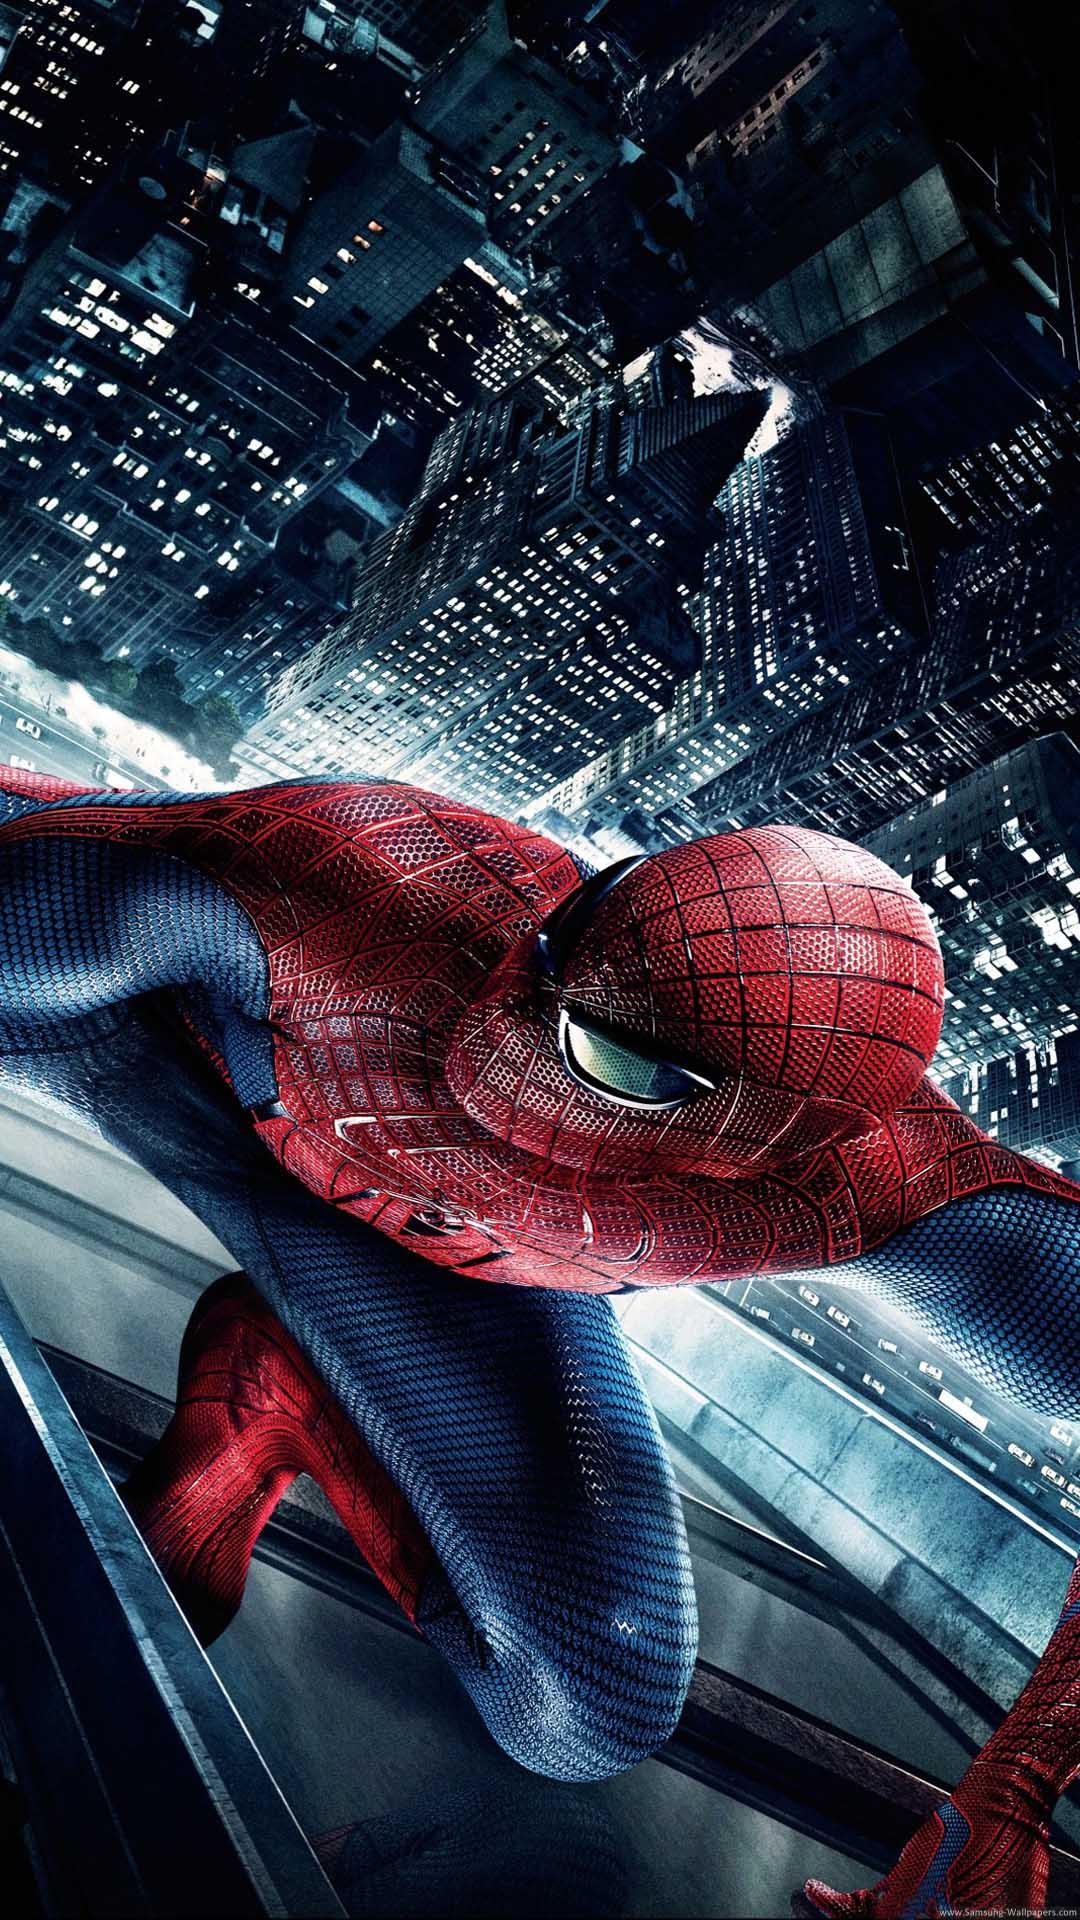 Spider Man Desktop Samsung Galaxy S4 Wallpaper - Desktop Wallpapers Spiderman Full Hd - HD Wallpaper